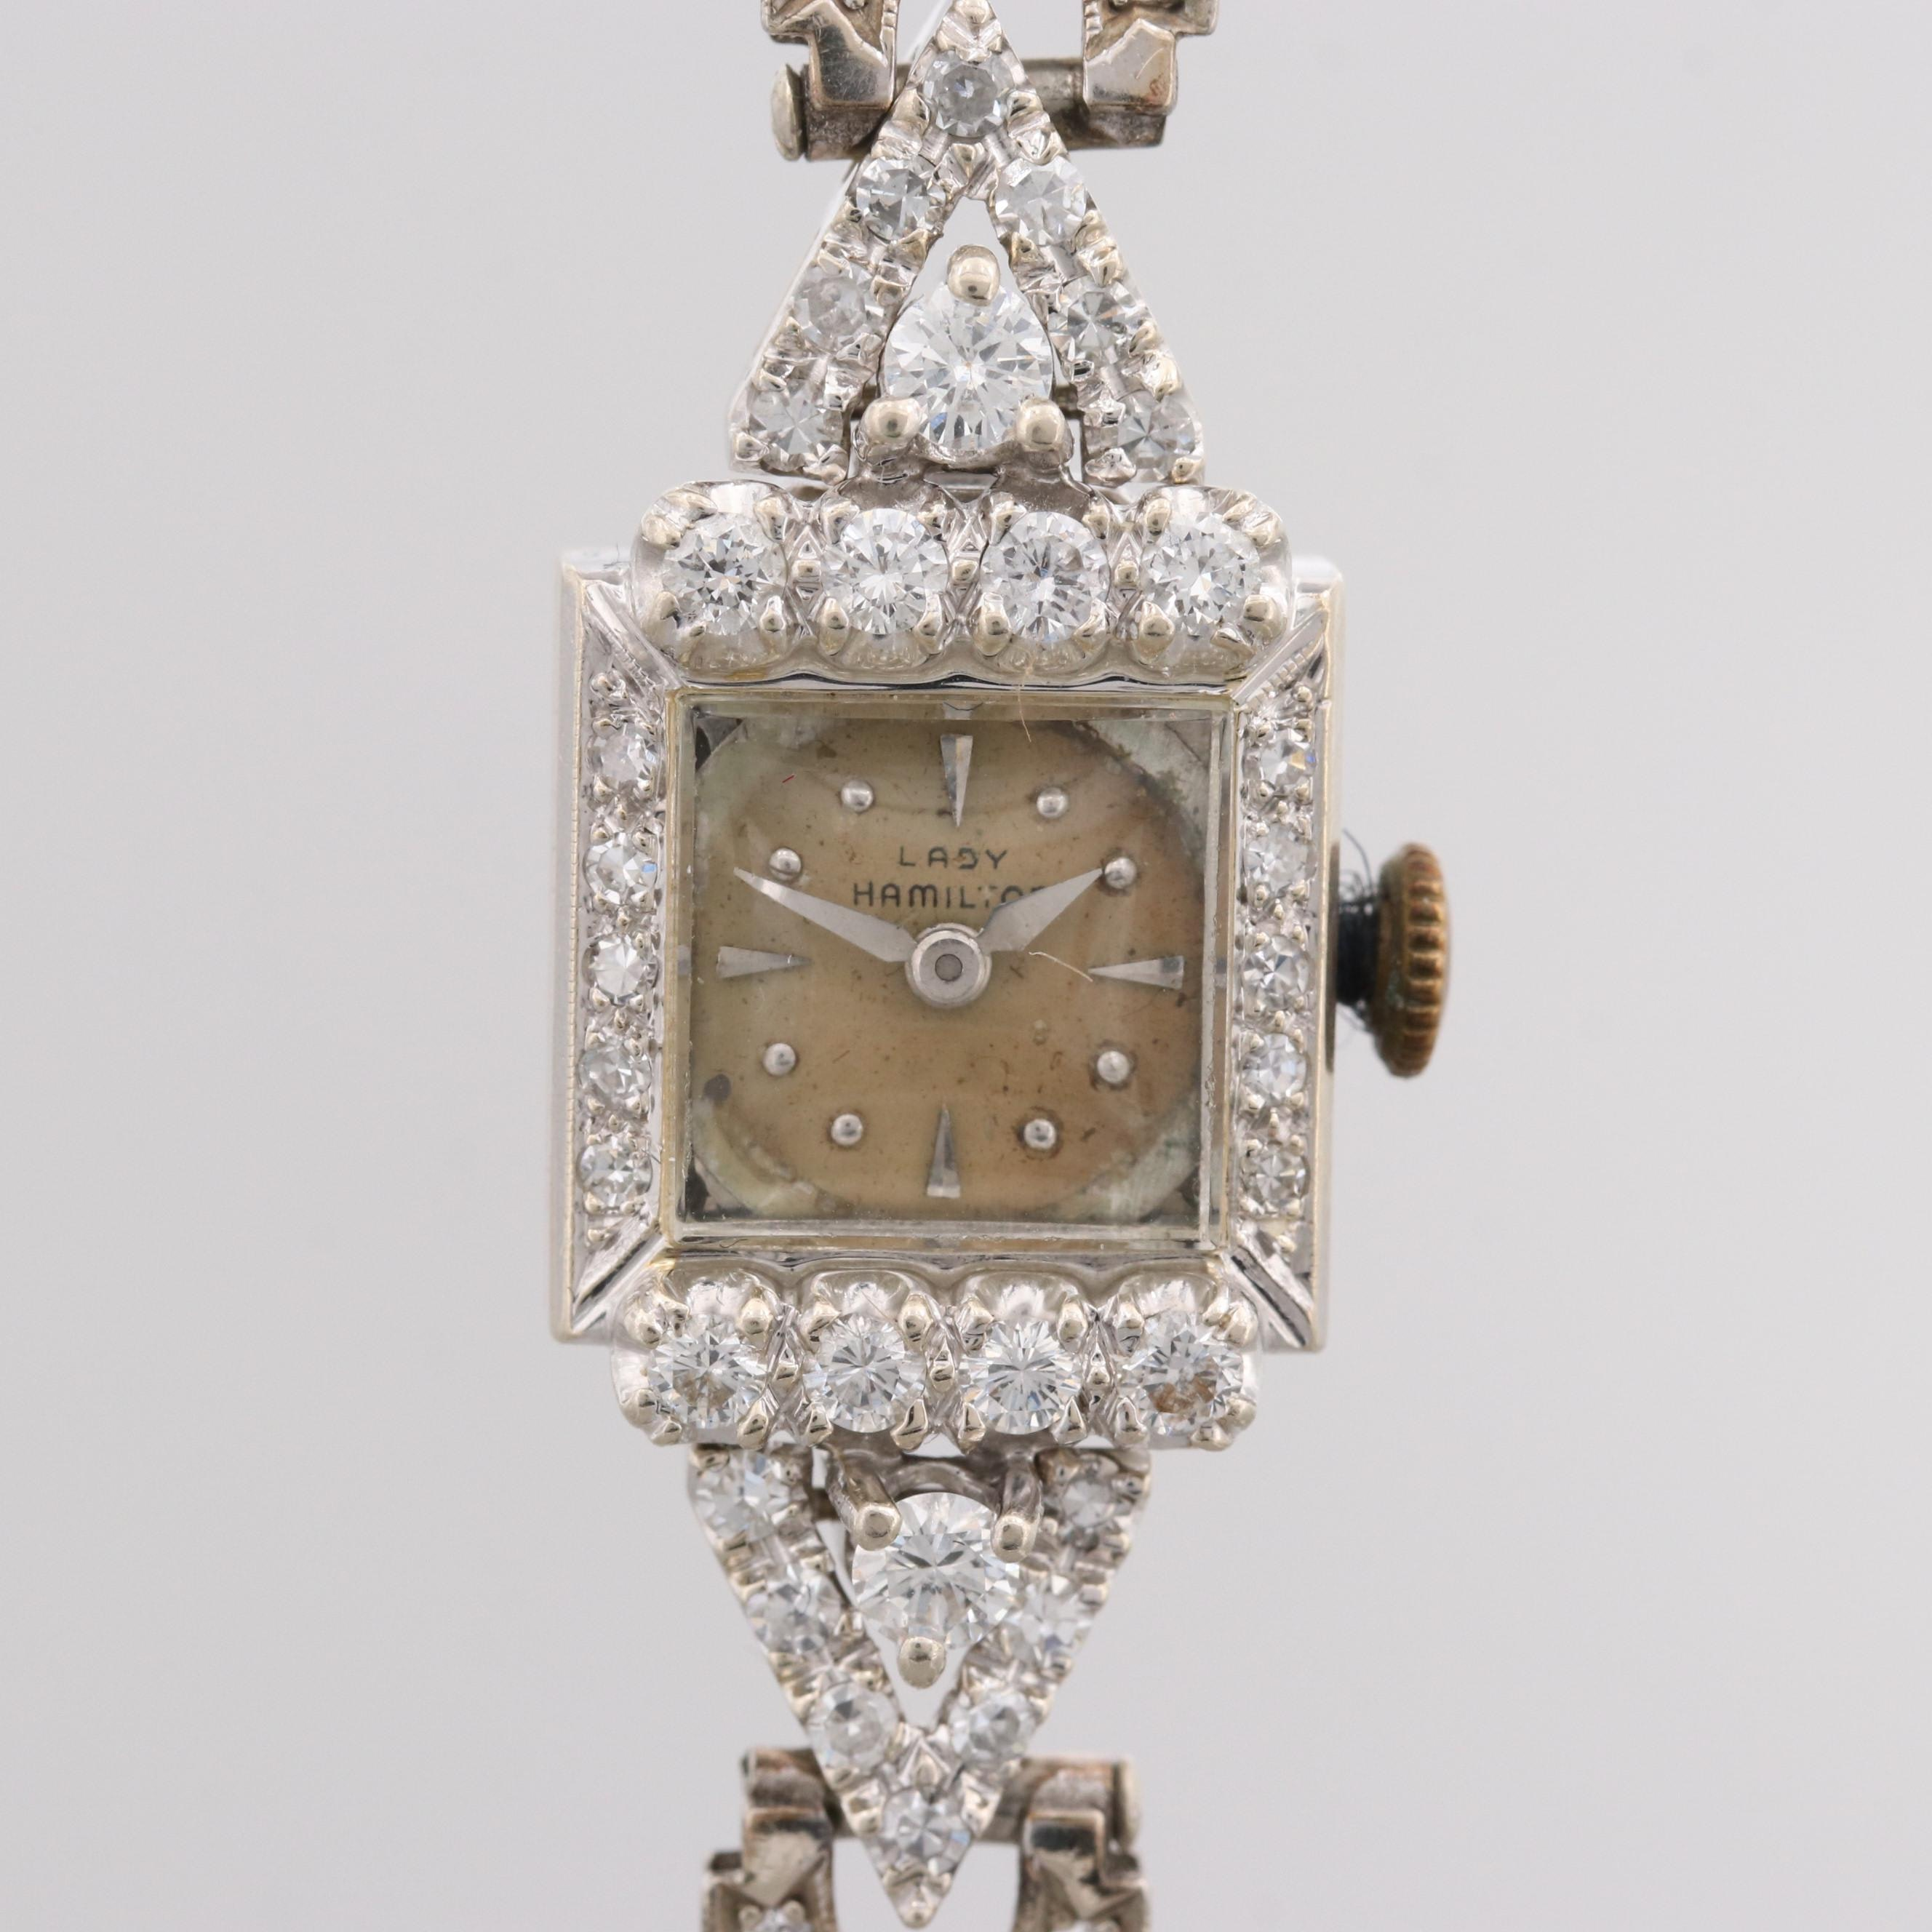 Lady Hamilton 14K White Gold Wristwatch With Diamond Bezel and Lugs